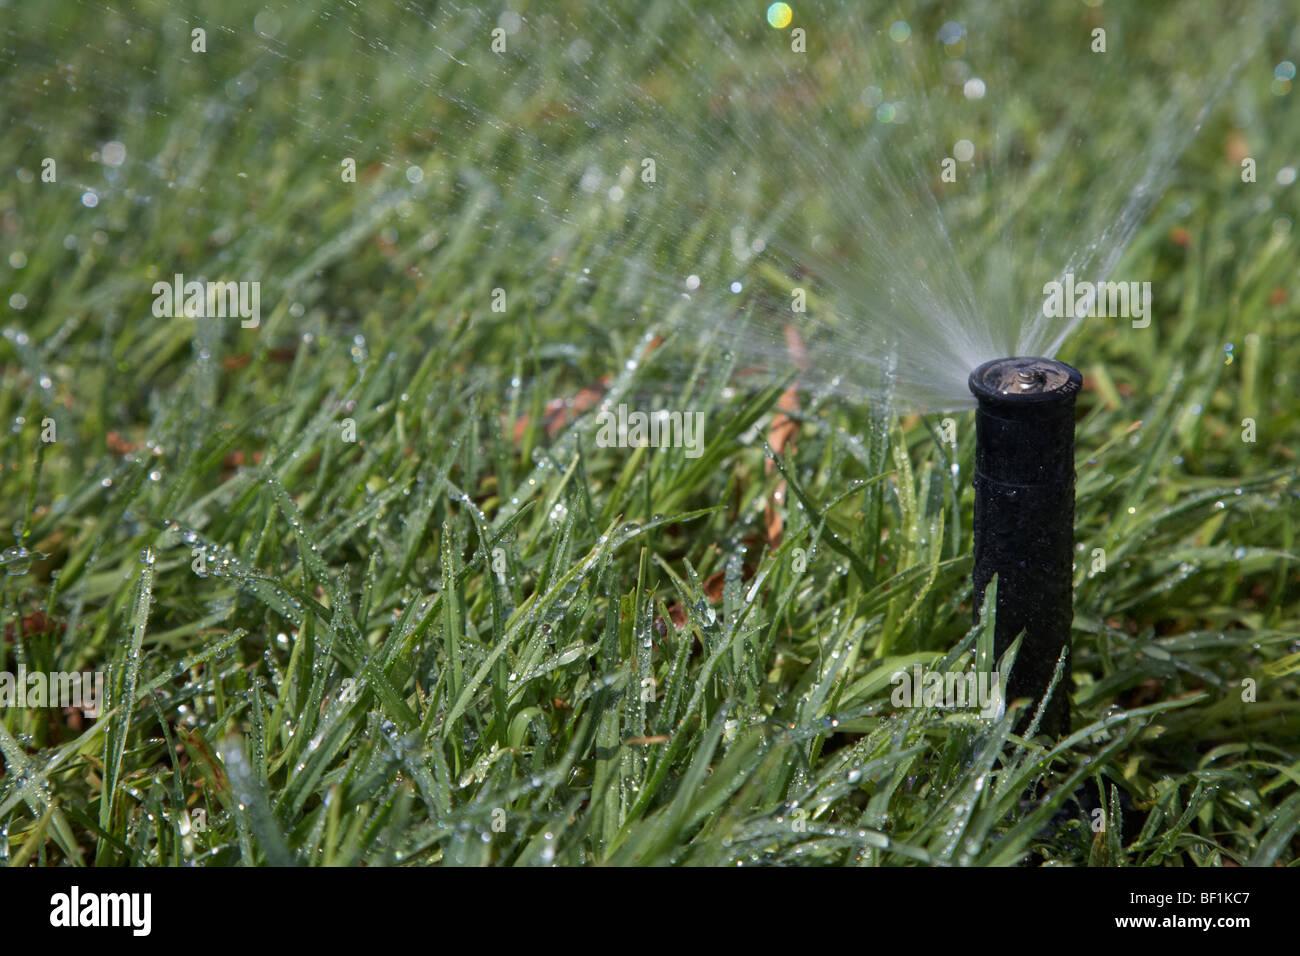 garden grass water sprinkler spraying water over grass - Stock Image